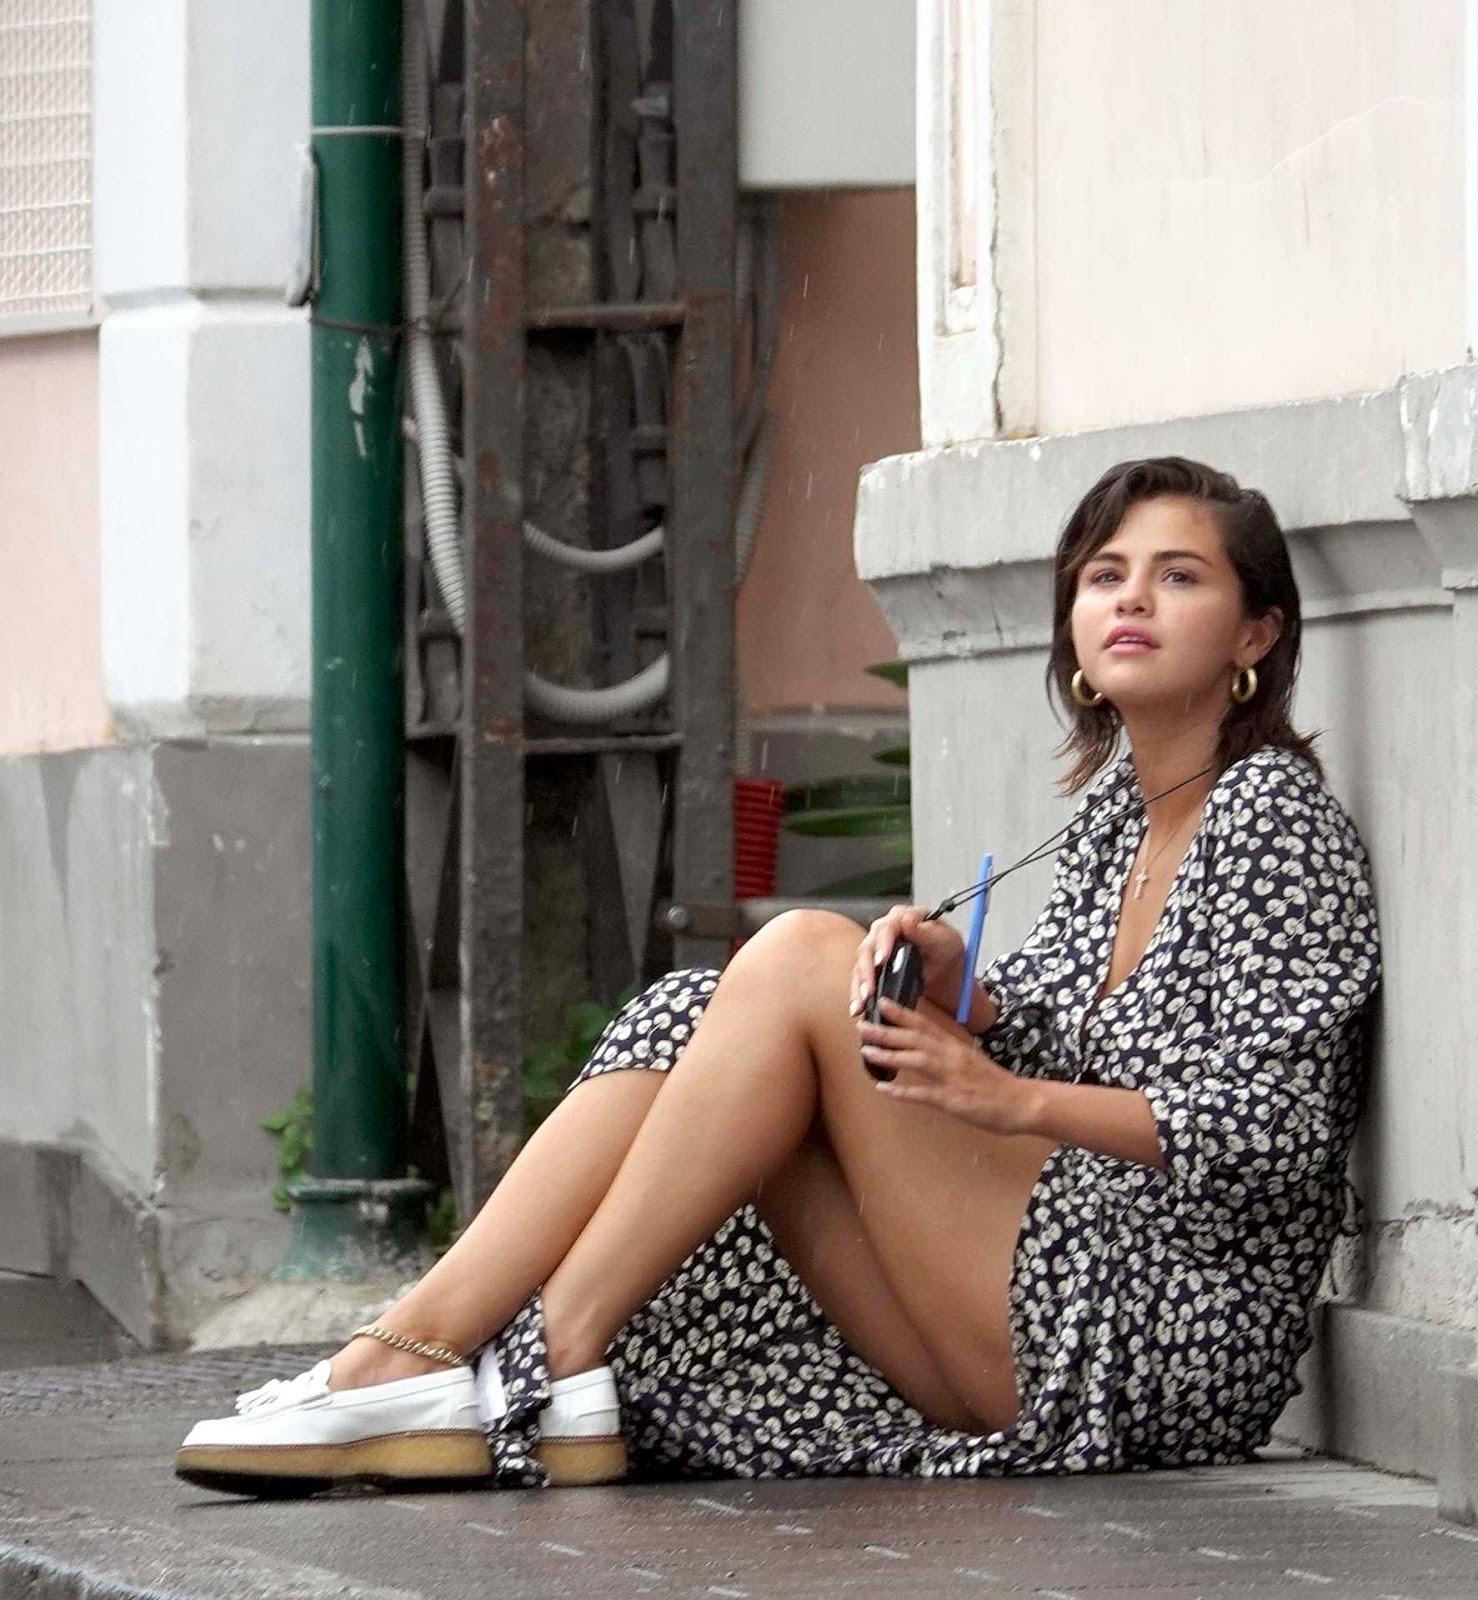 upskrit Selena gomez